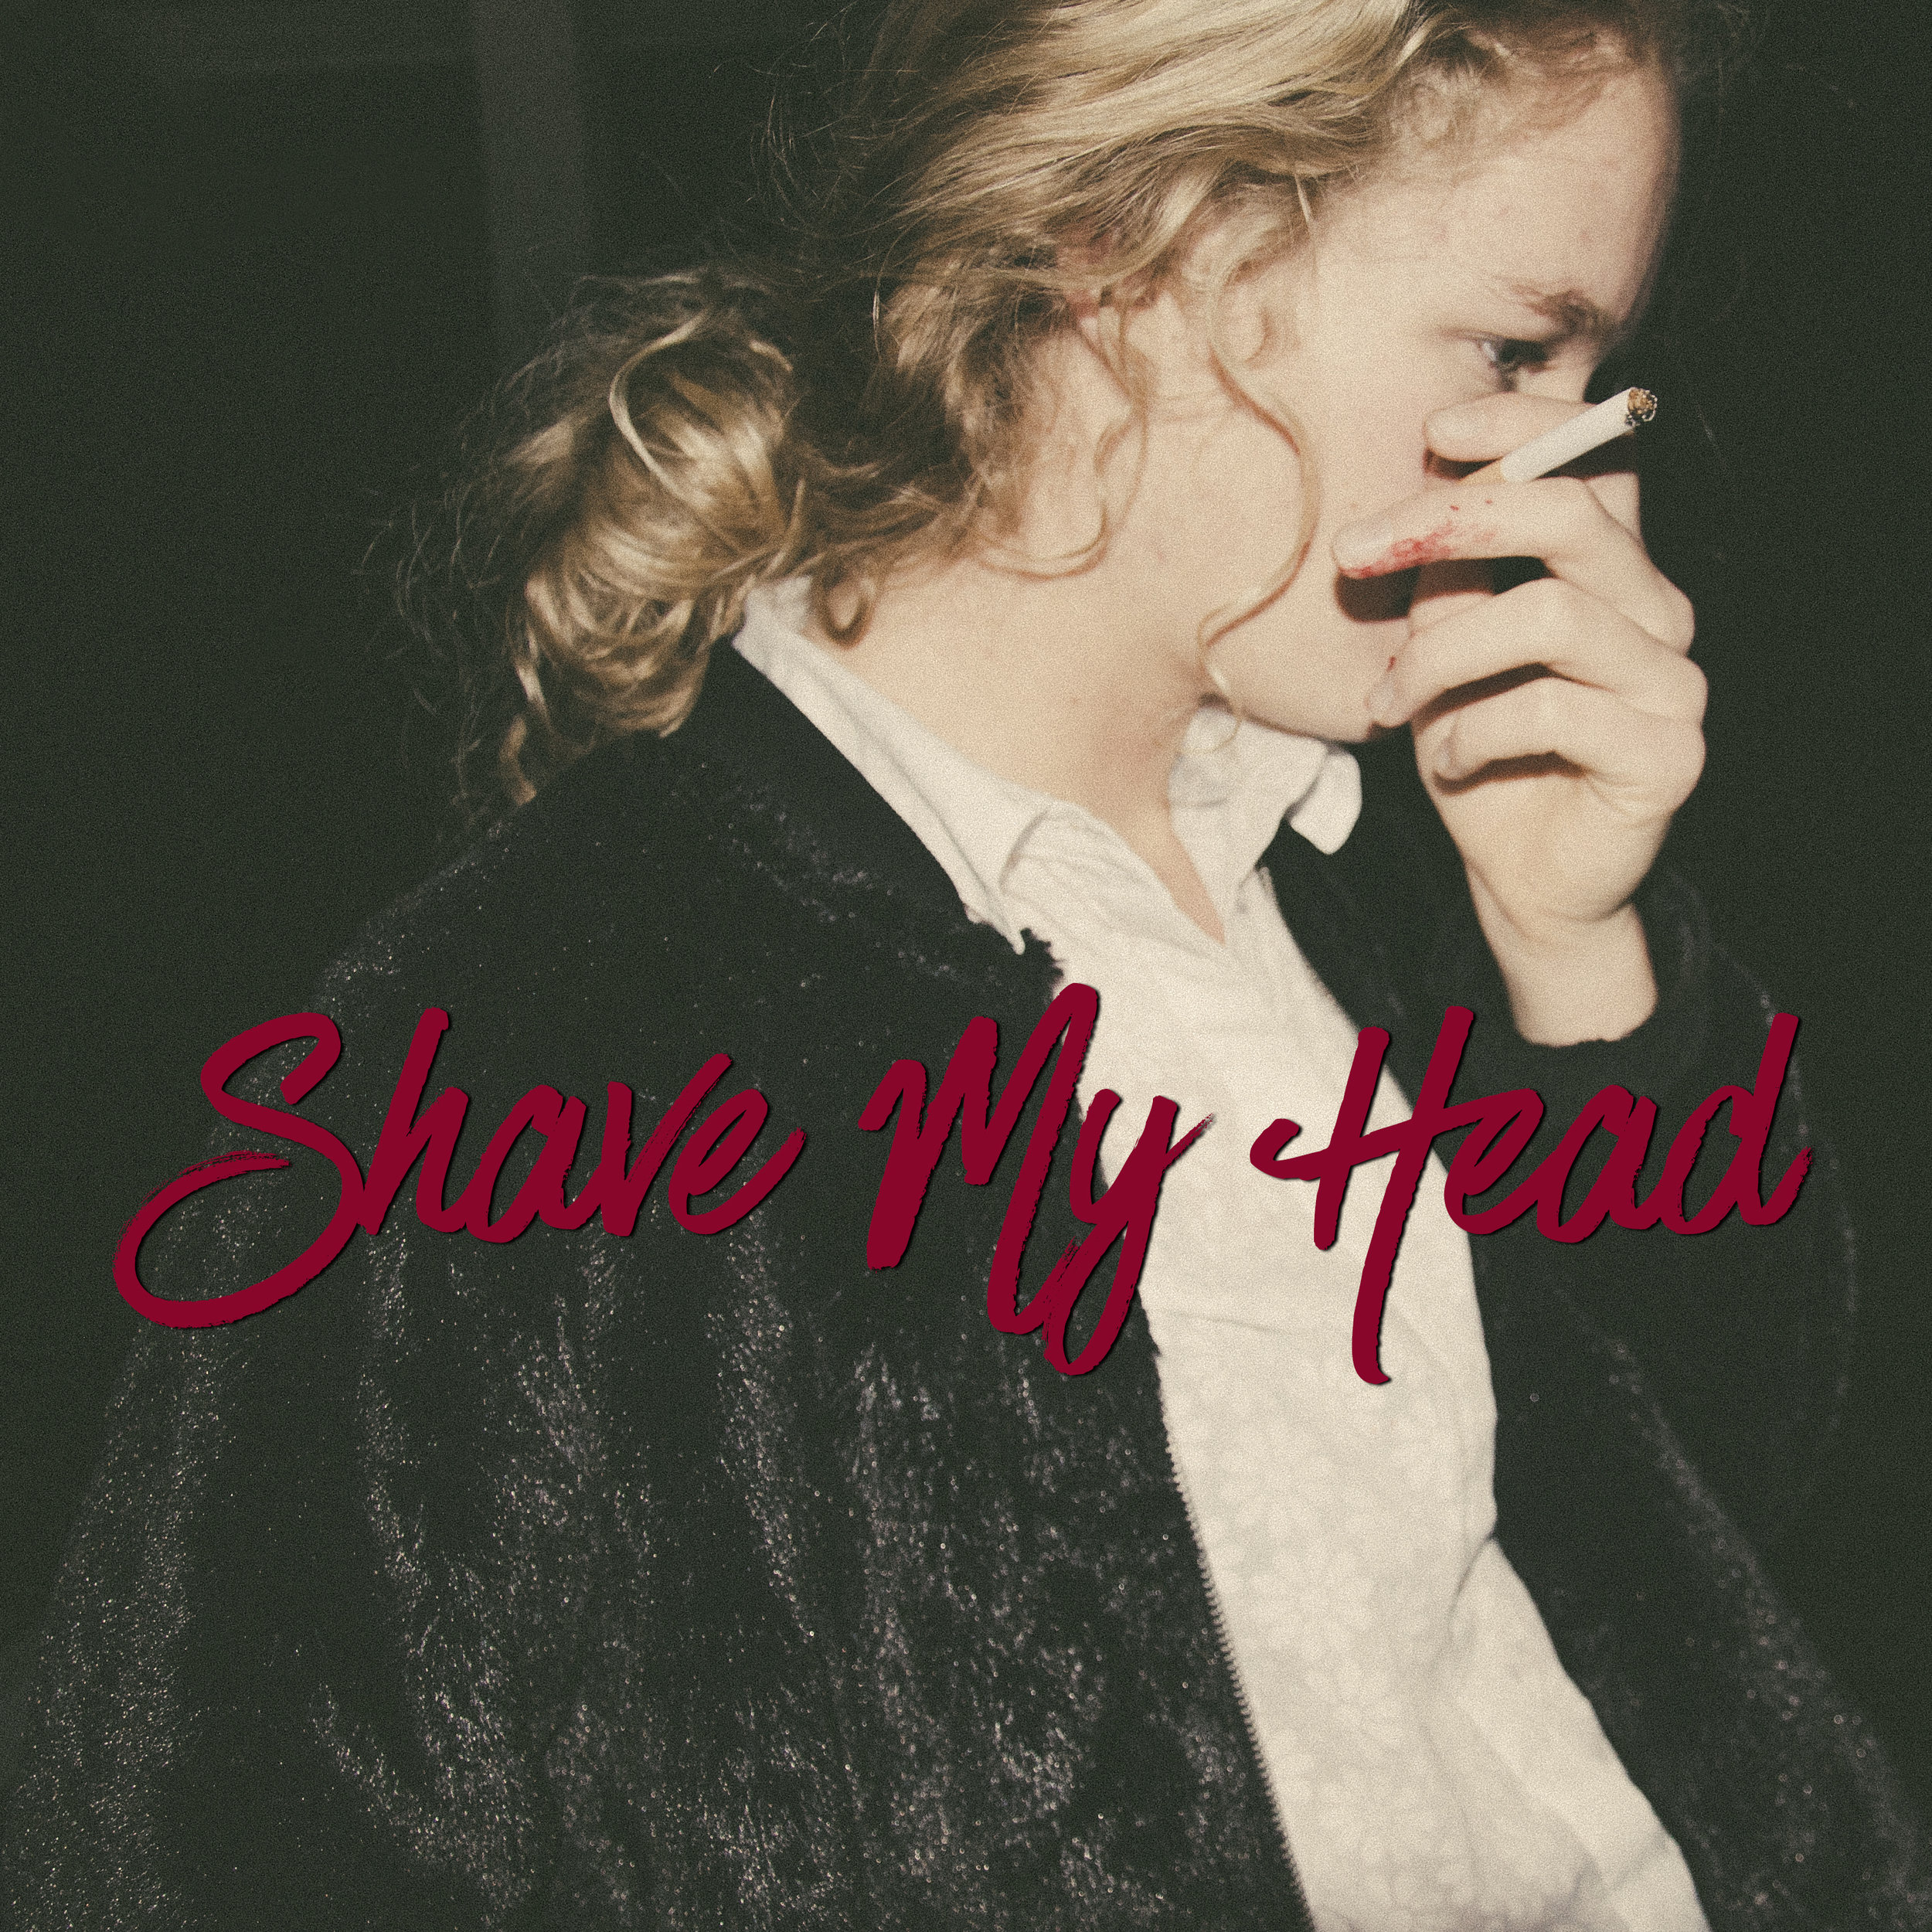 Slutface - Shave My Head